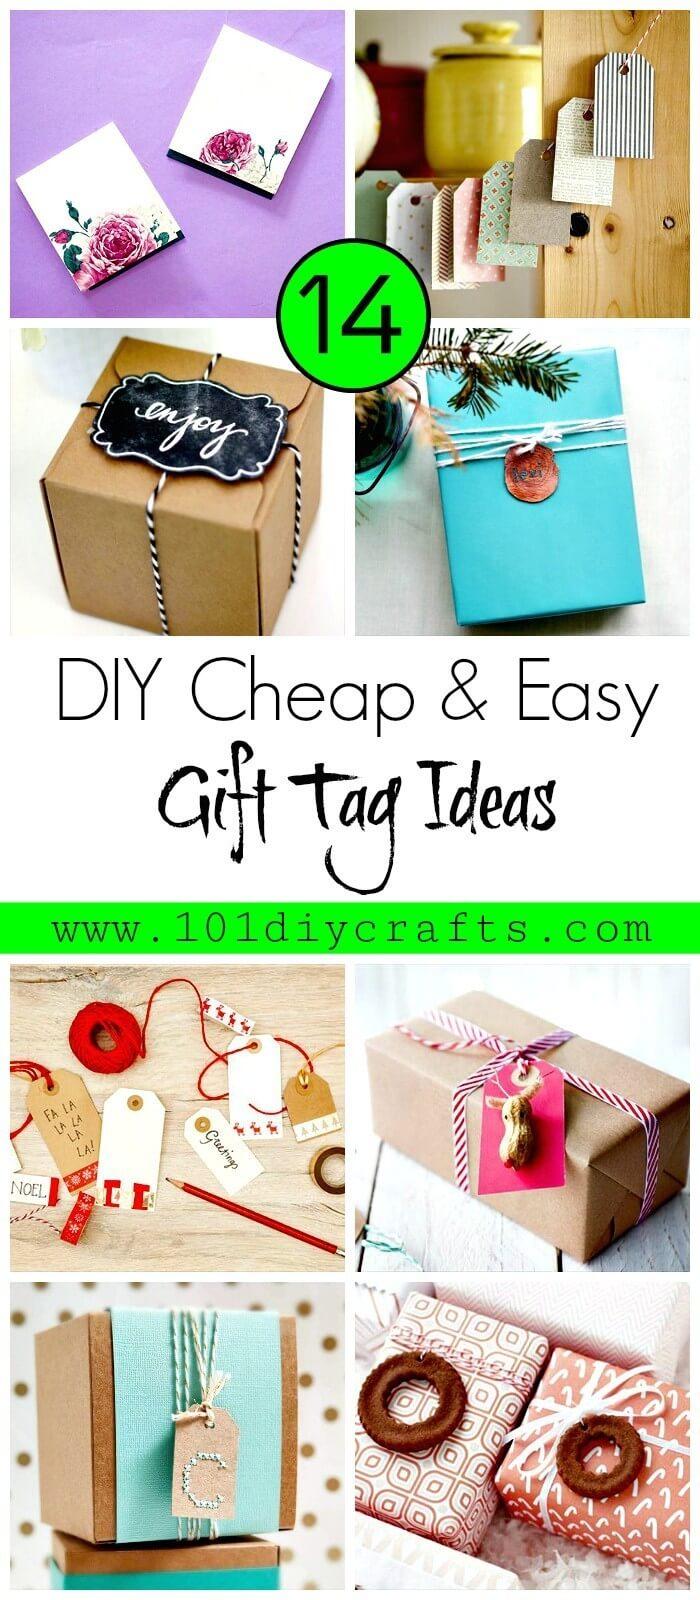 14 DIY Cheap & Easy Gift Tag Ideas